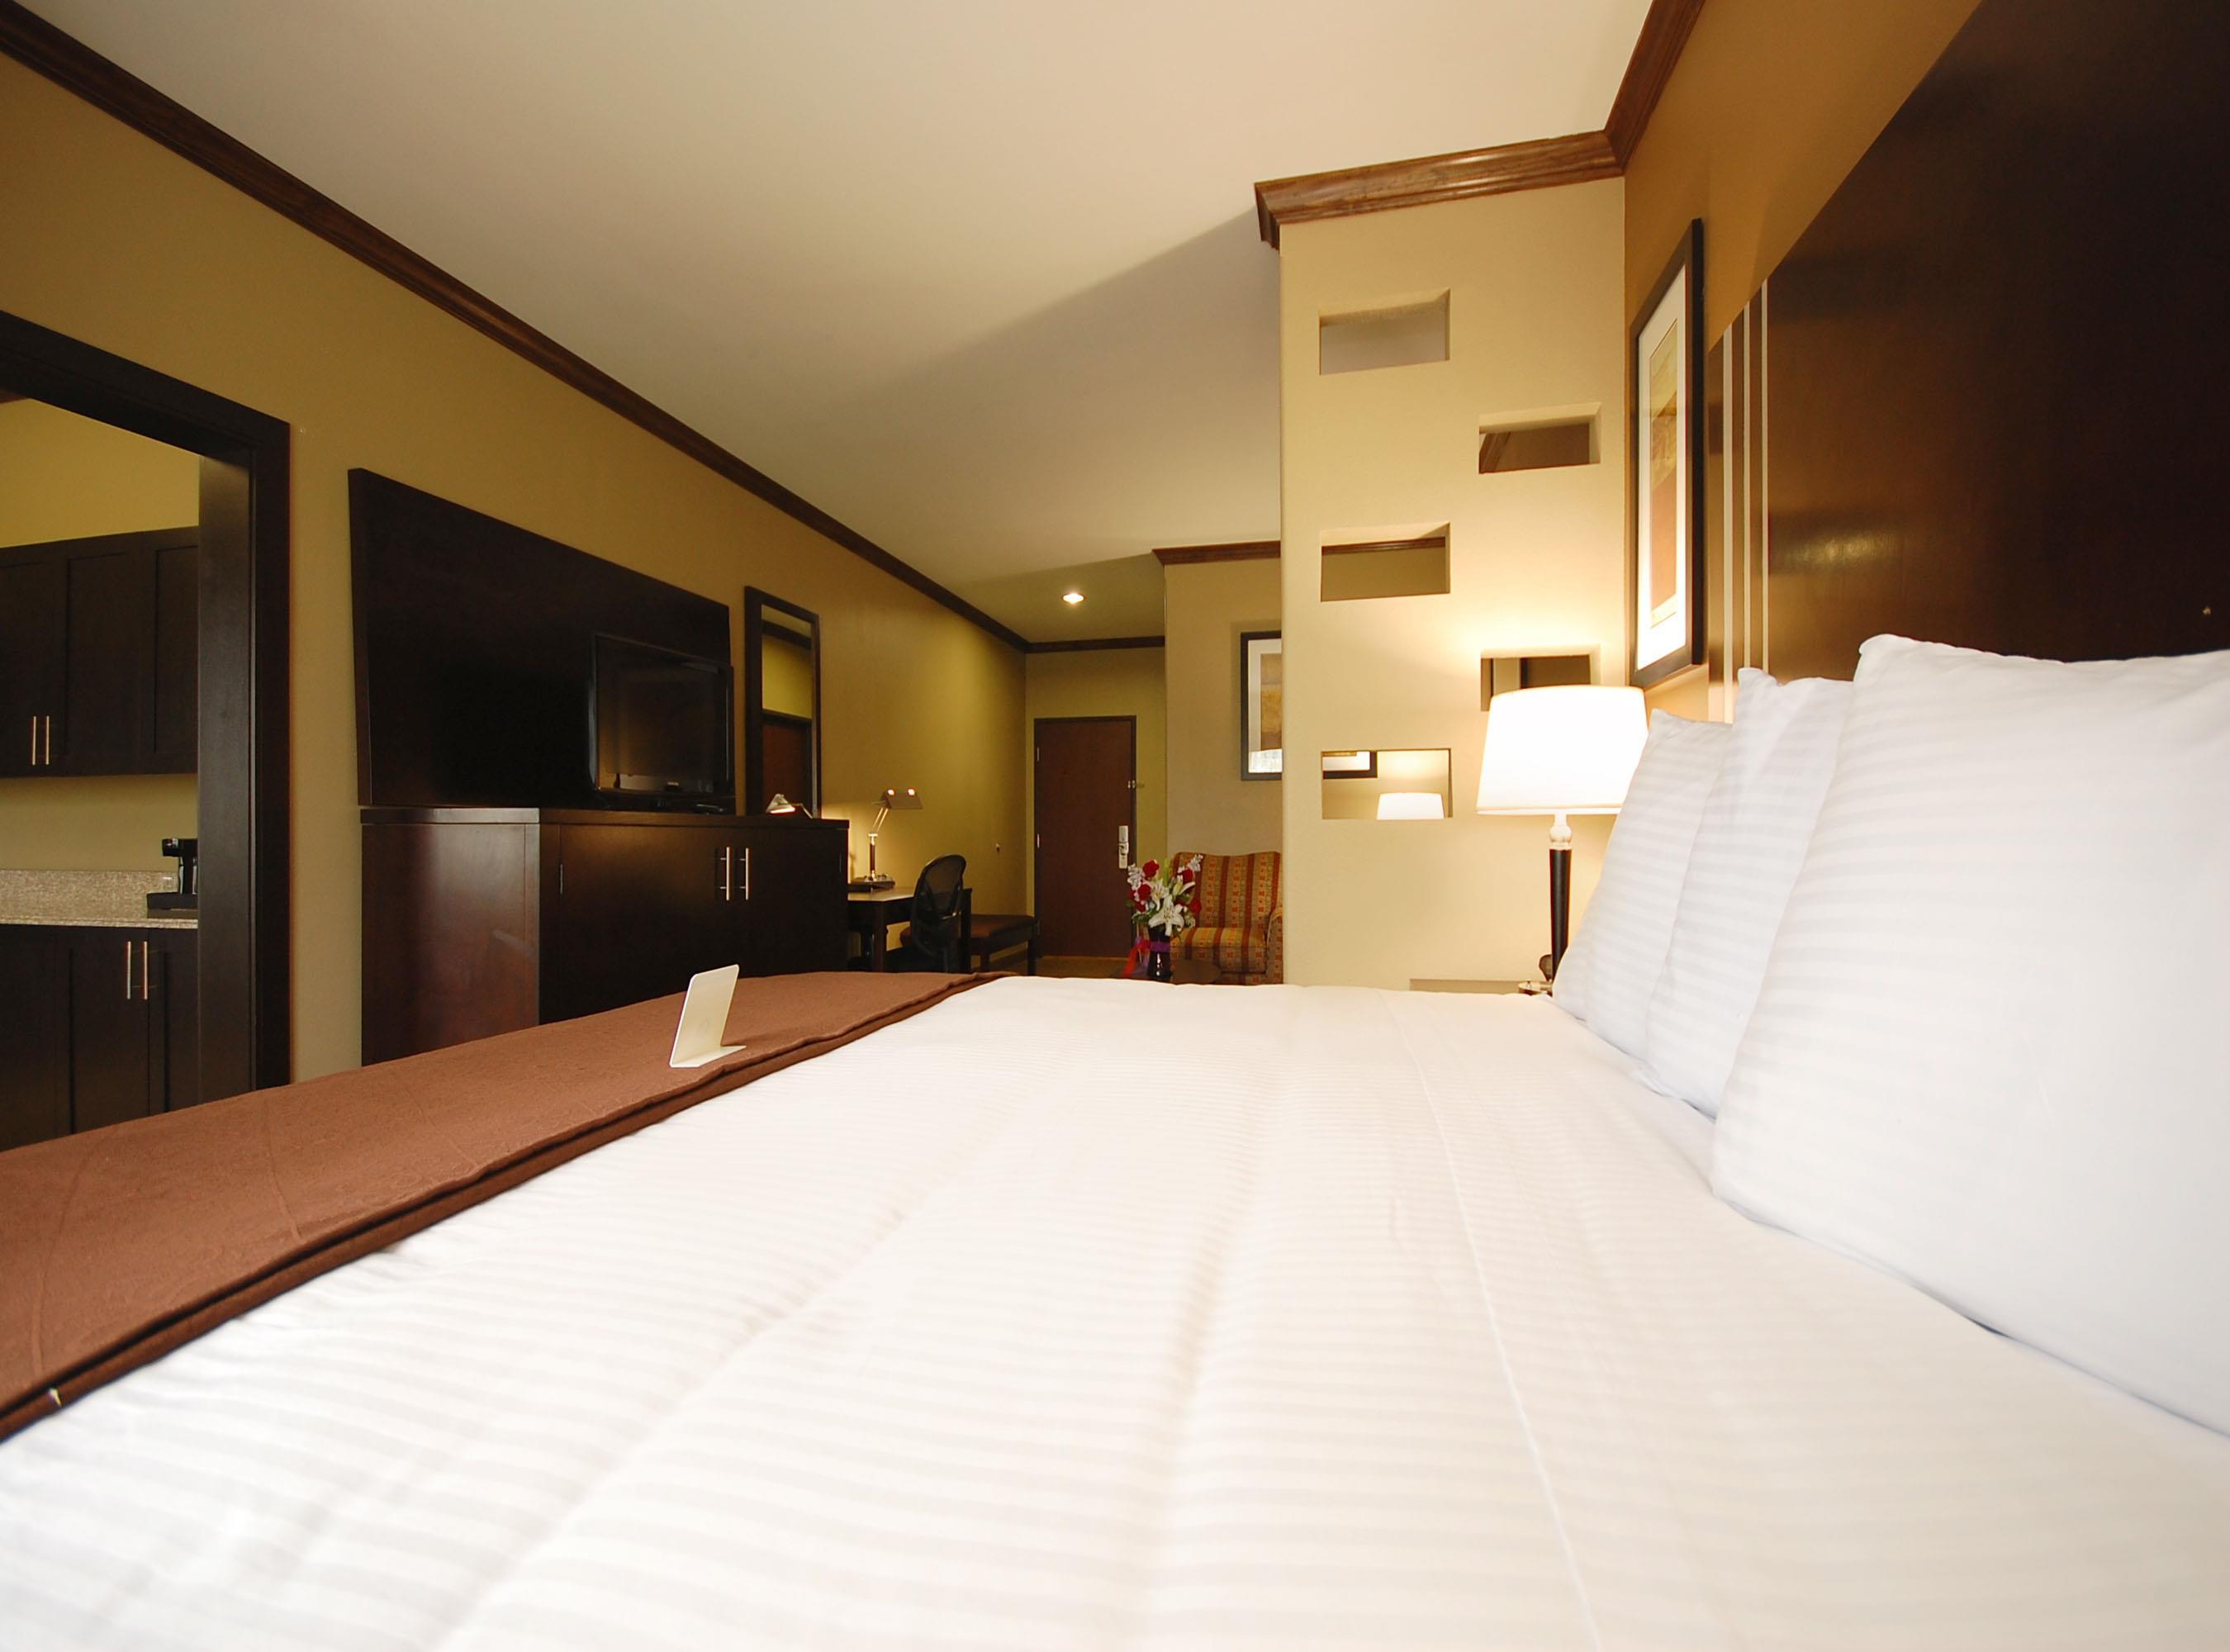 Best Western Plus Texoma Hotel & Suites image 27